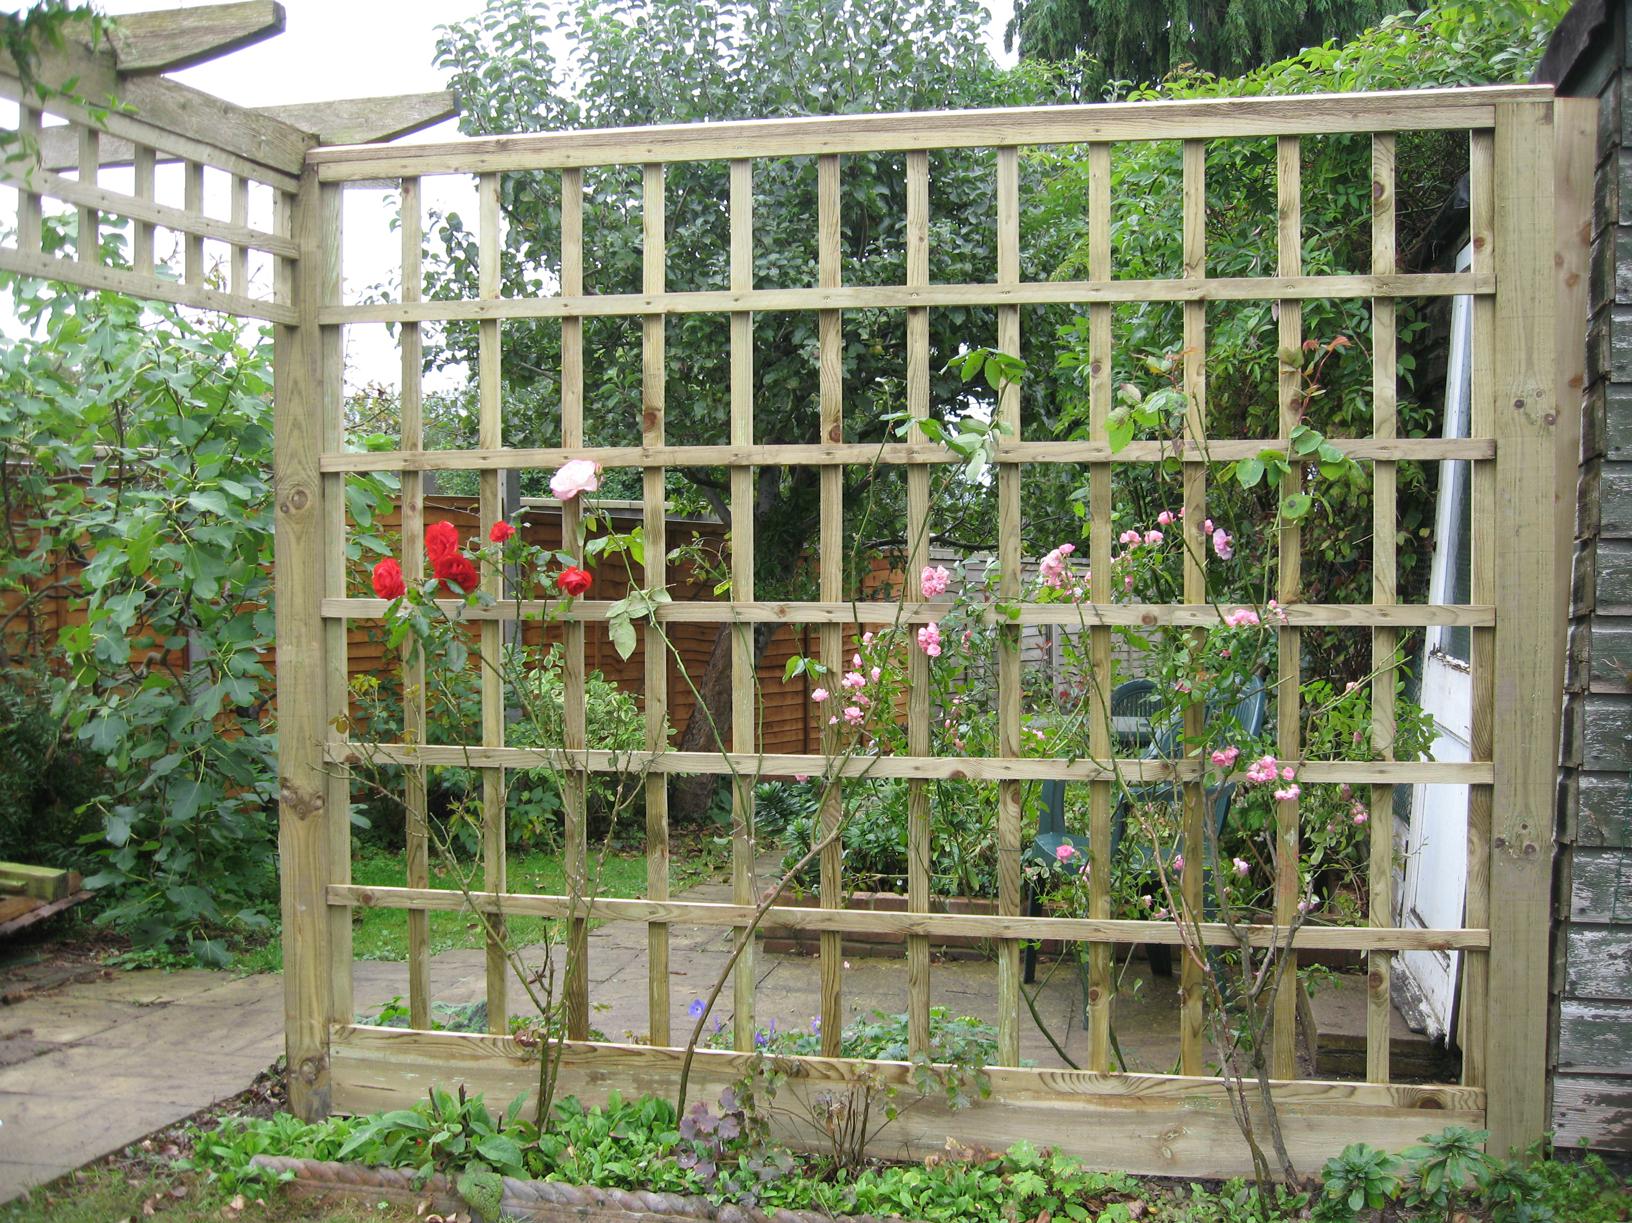 dahkero: Made to measure garden storage sheds